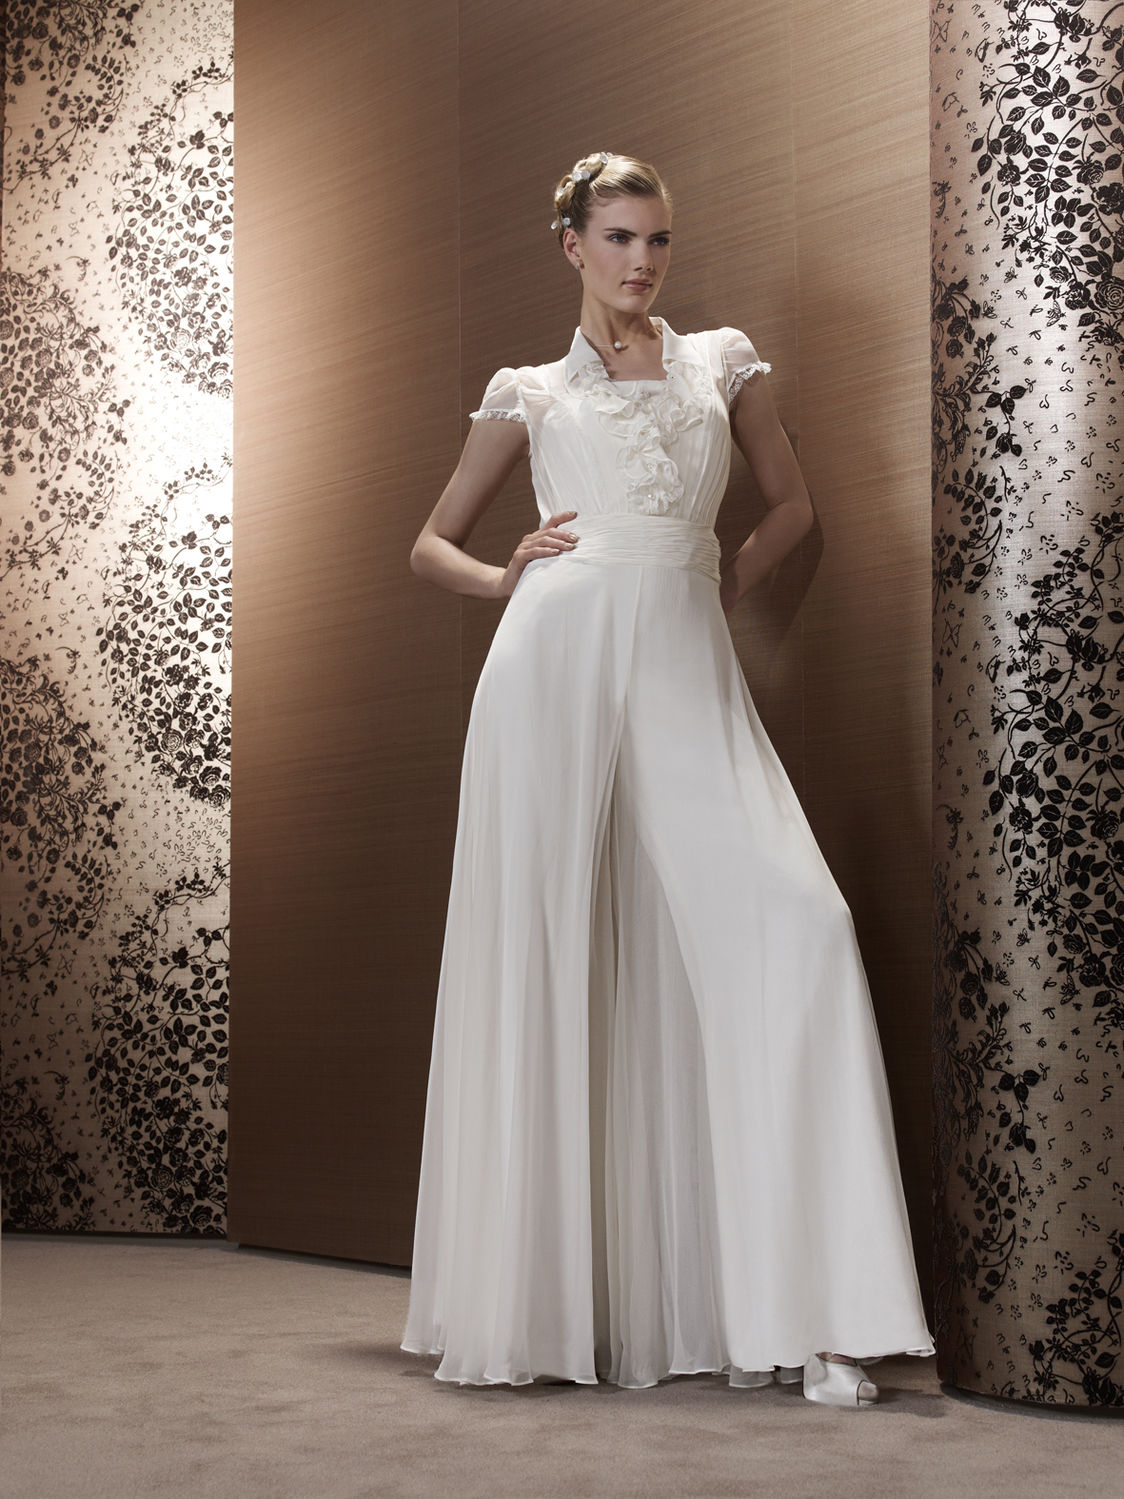 Pronuptia Bridal 2013 Spring Collection | The FashionBrides